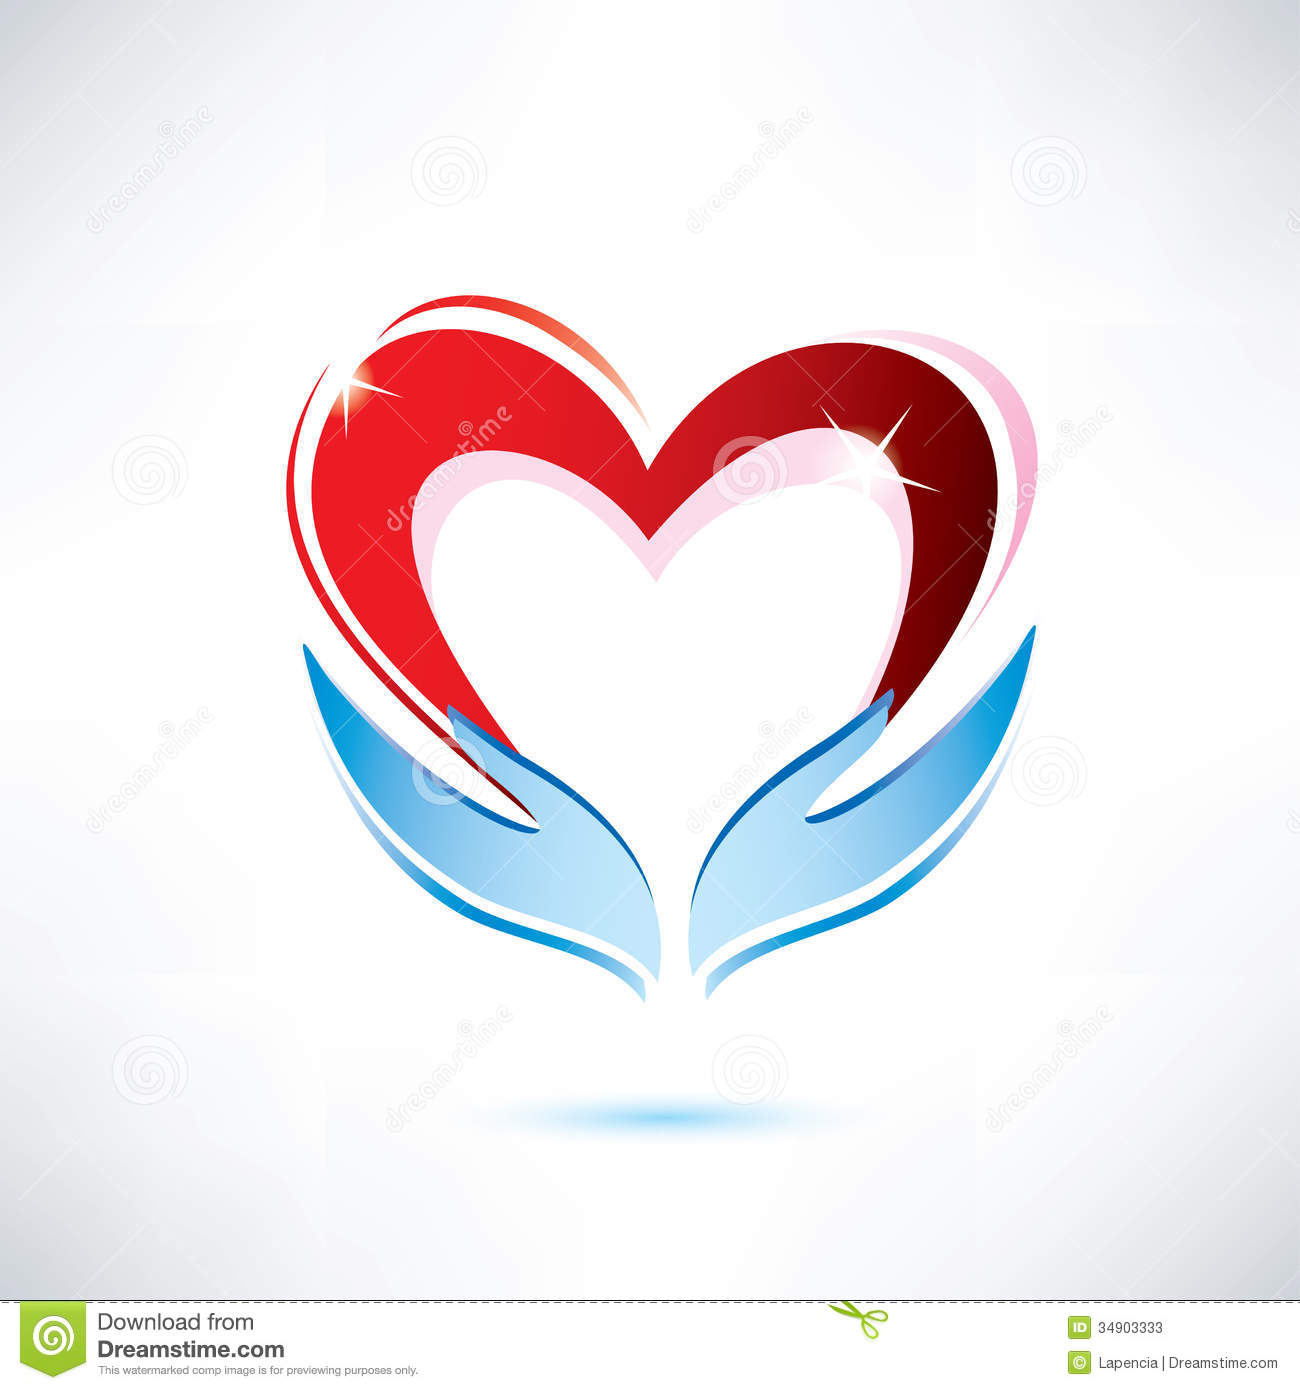 Hands Holding Heart Clipart.